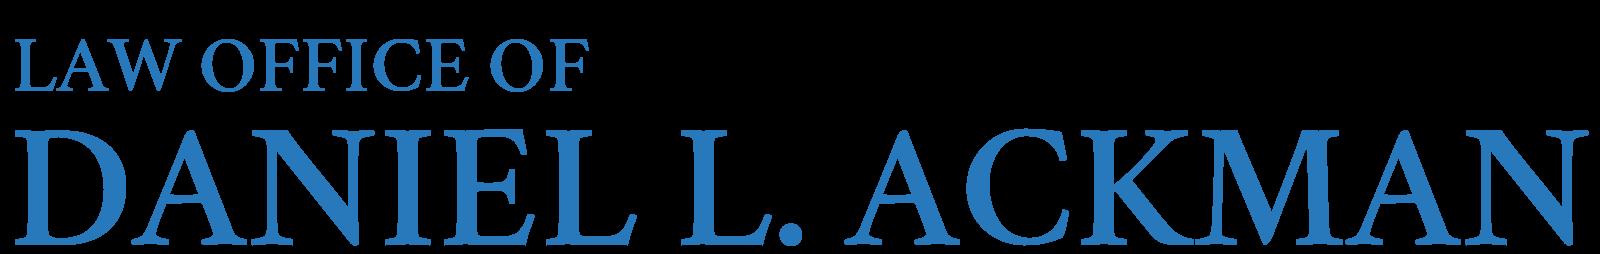 Law Office of Daniel L. Ackman